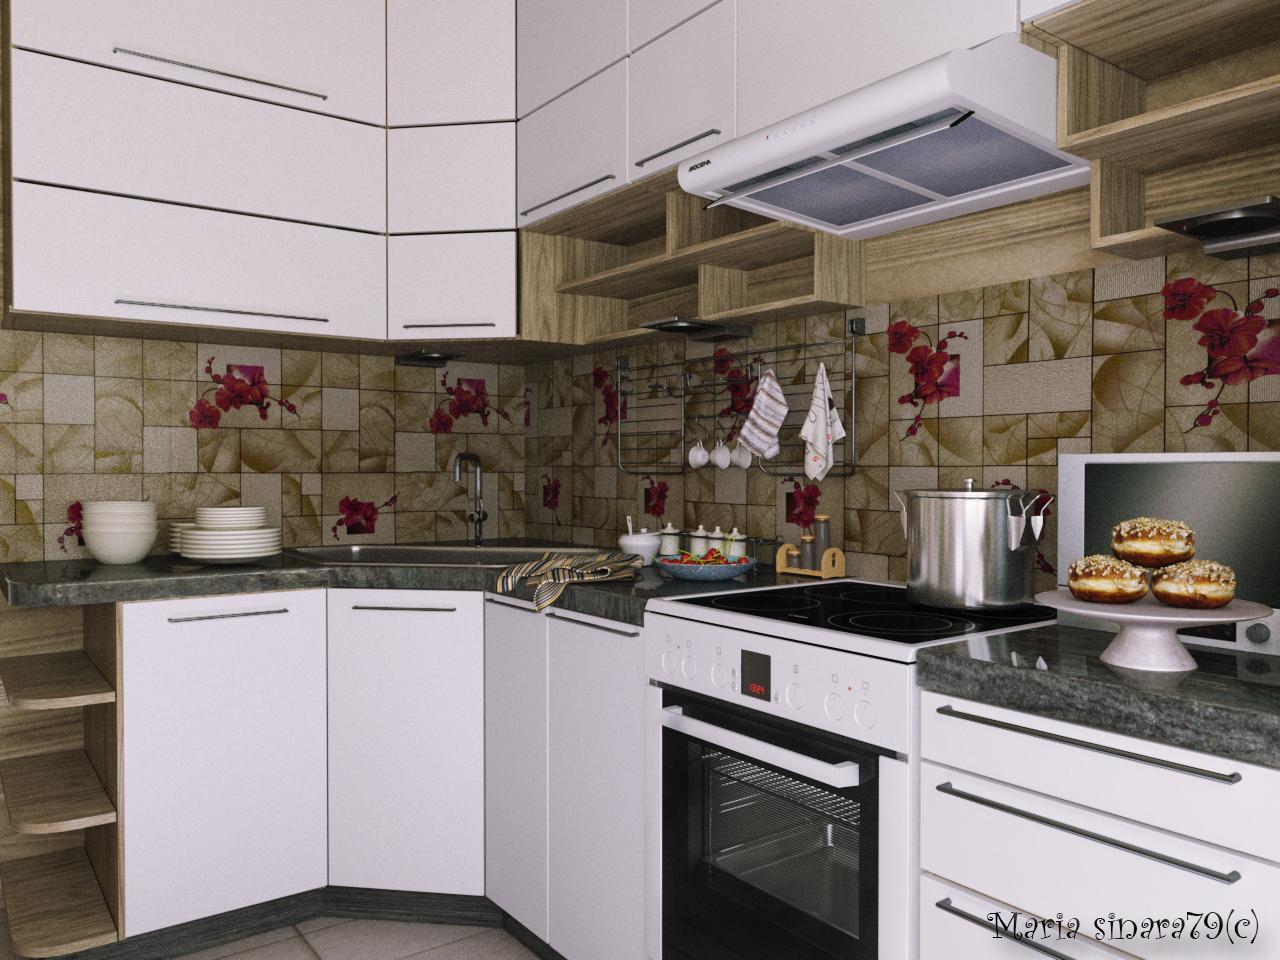 Cucina calda in 3d max corona render immagine